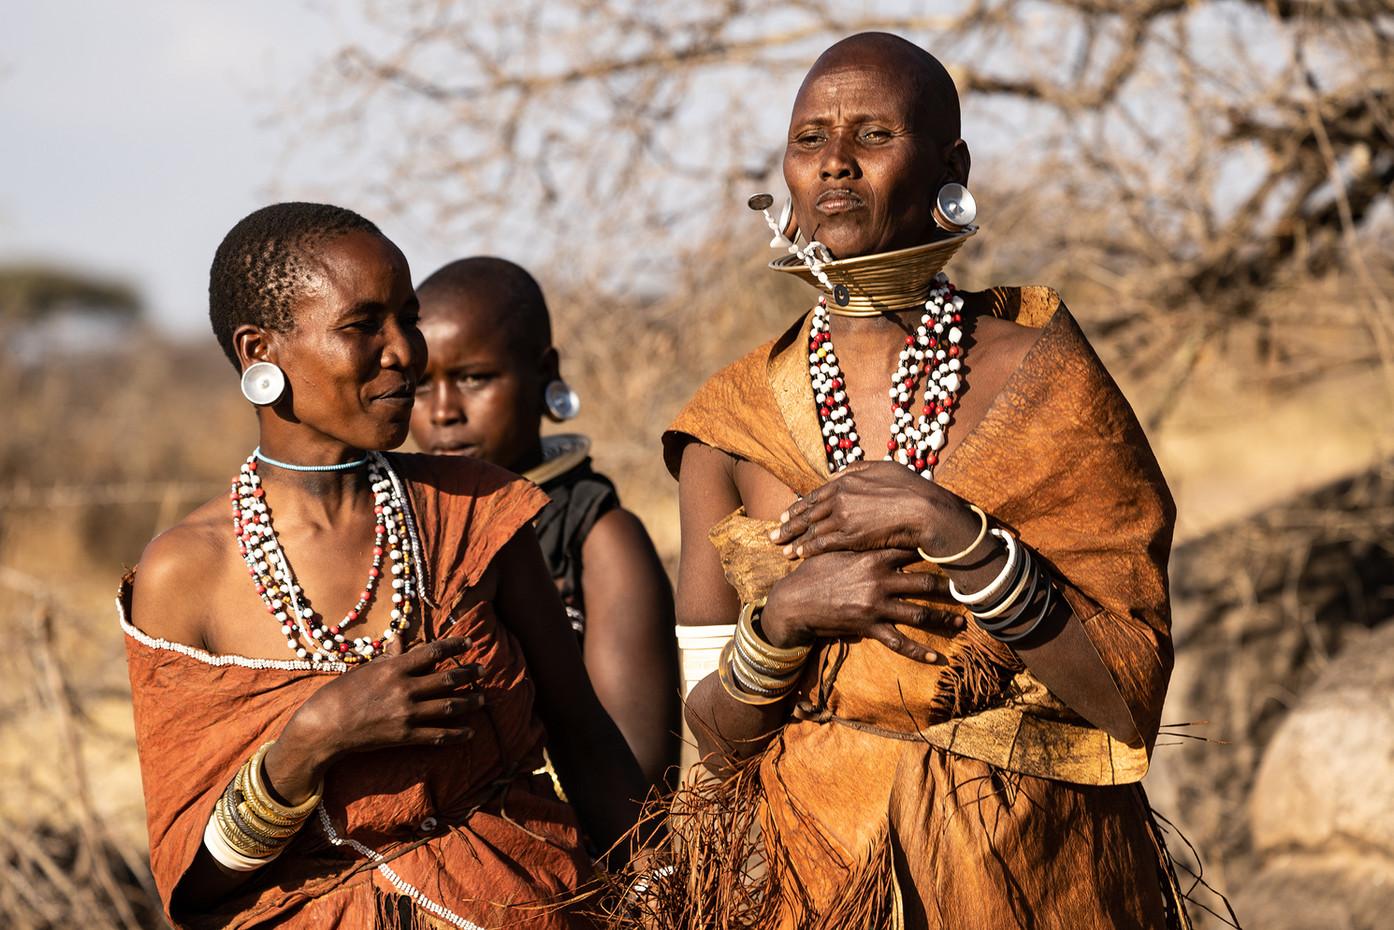 Datoga women in Makao Village, Tanzania